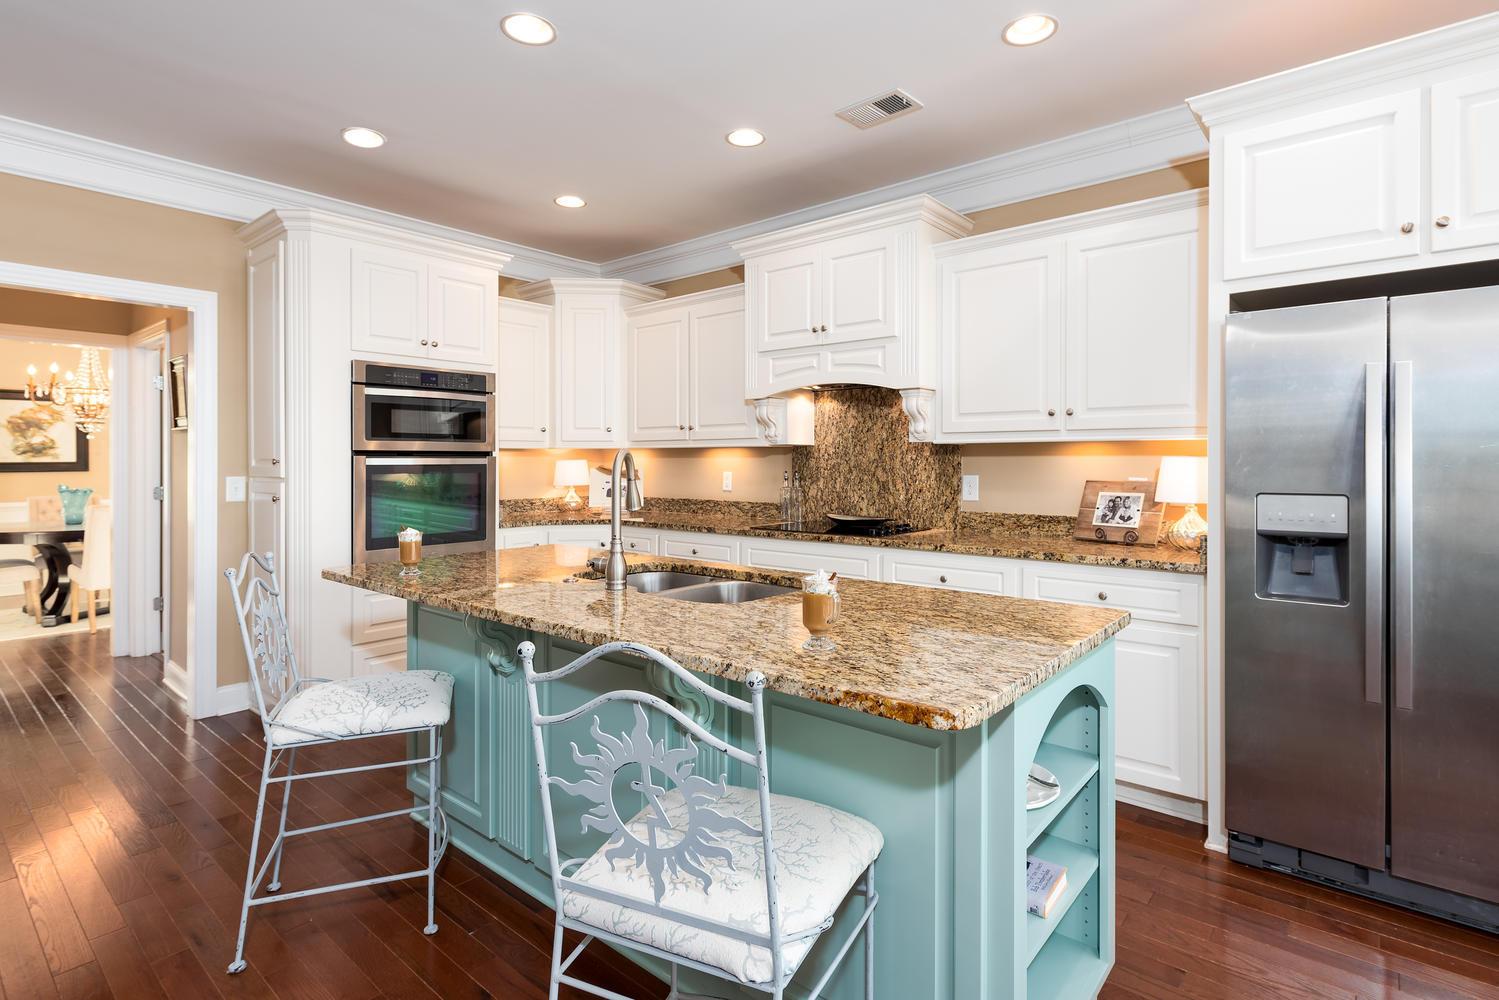 River Reach Pointe Homes For Sale - 1216 Rivers Reach Drive, Charleston, SC - 3